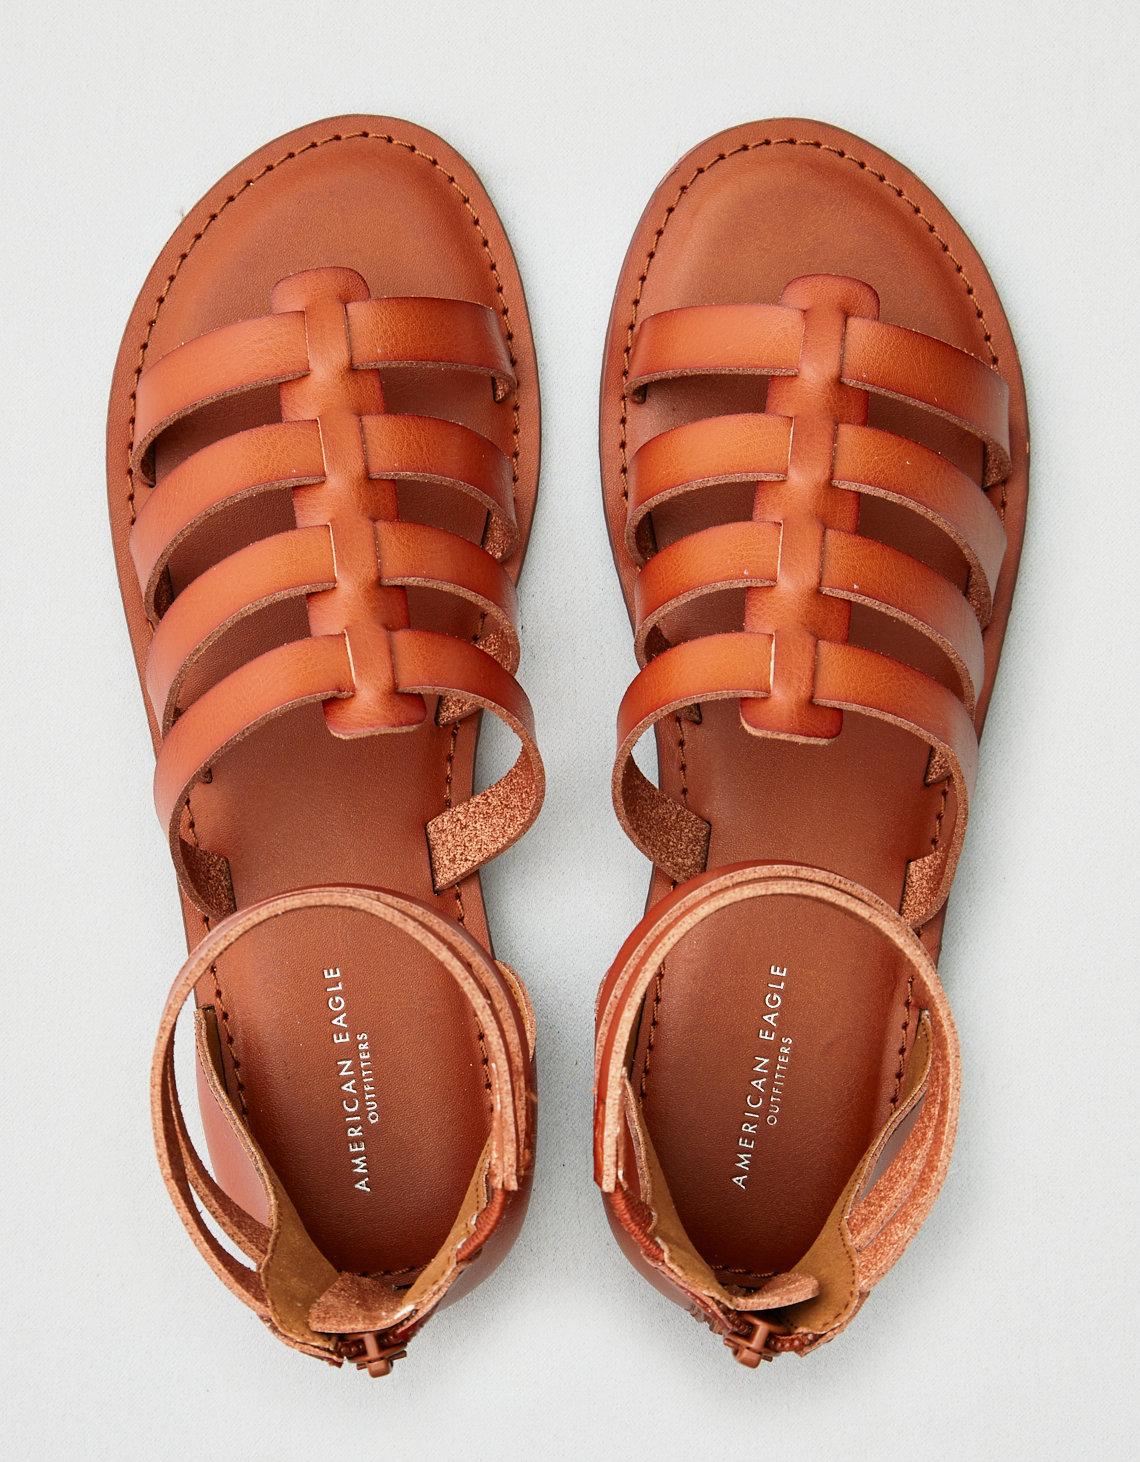 c0d5a95da39e9 AEO Gladiator Sandal. Placeholder image. Product Image